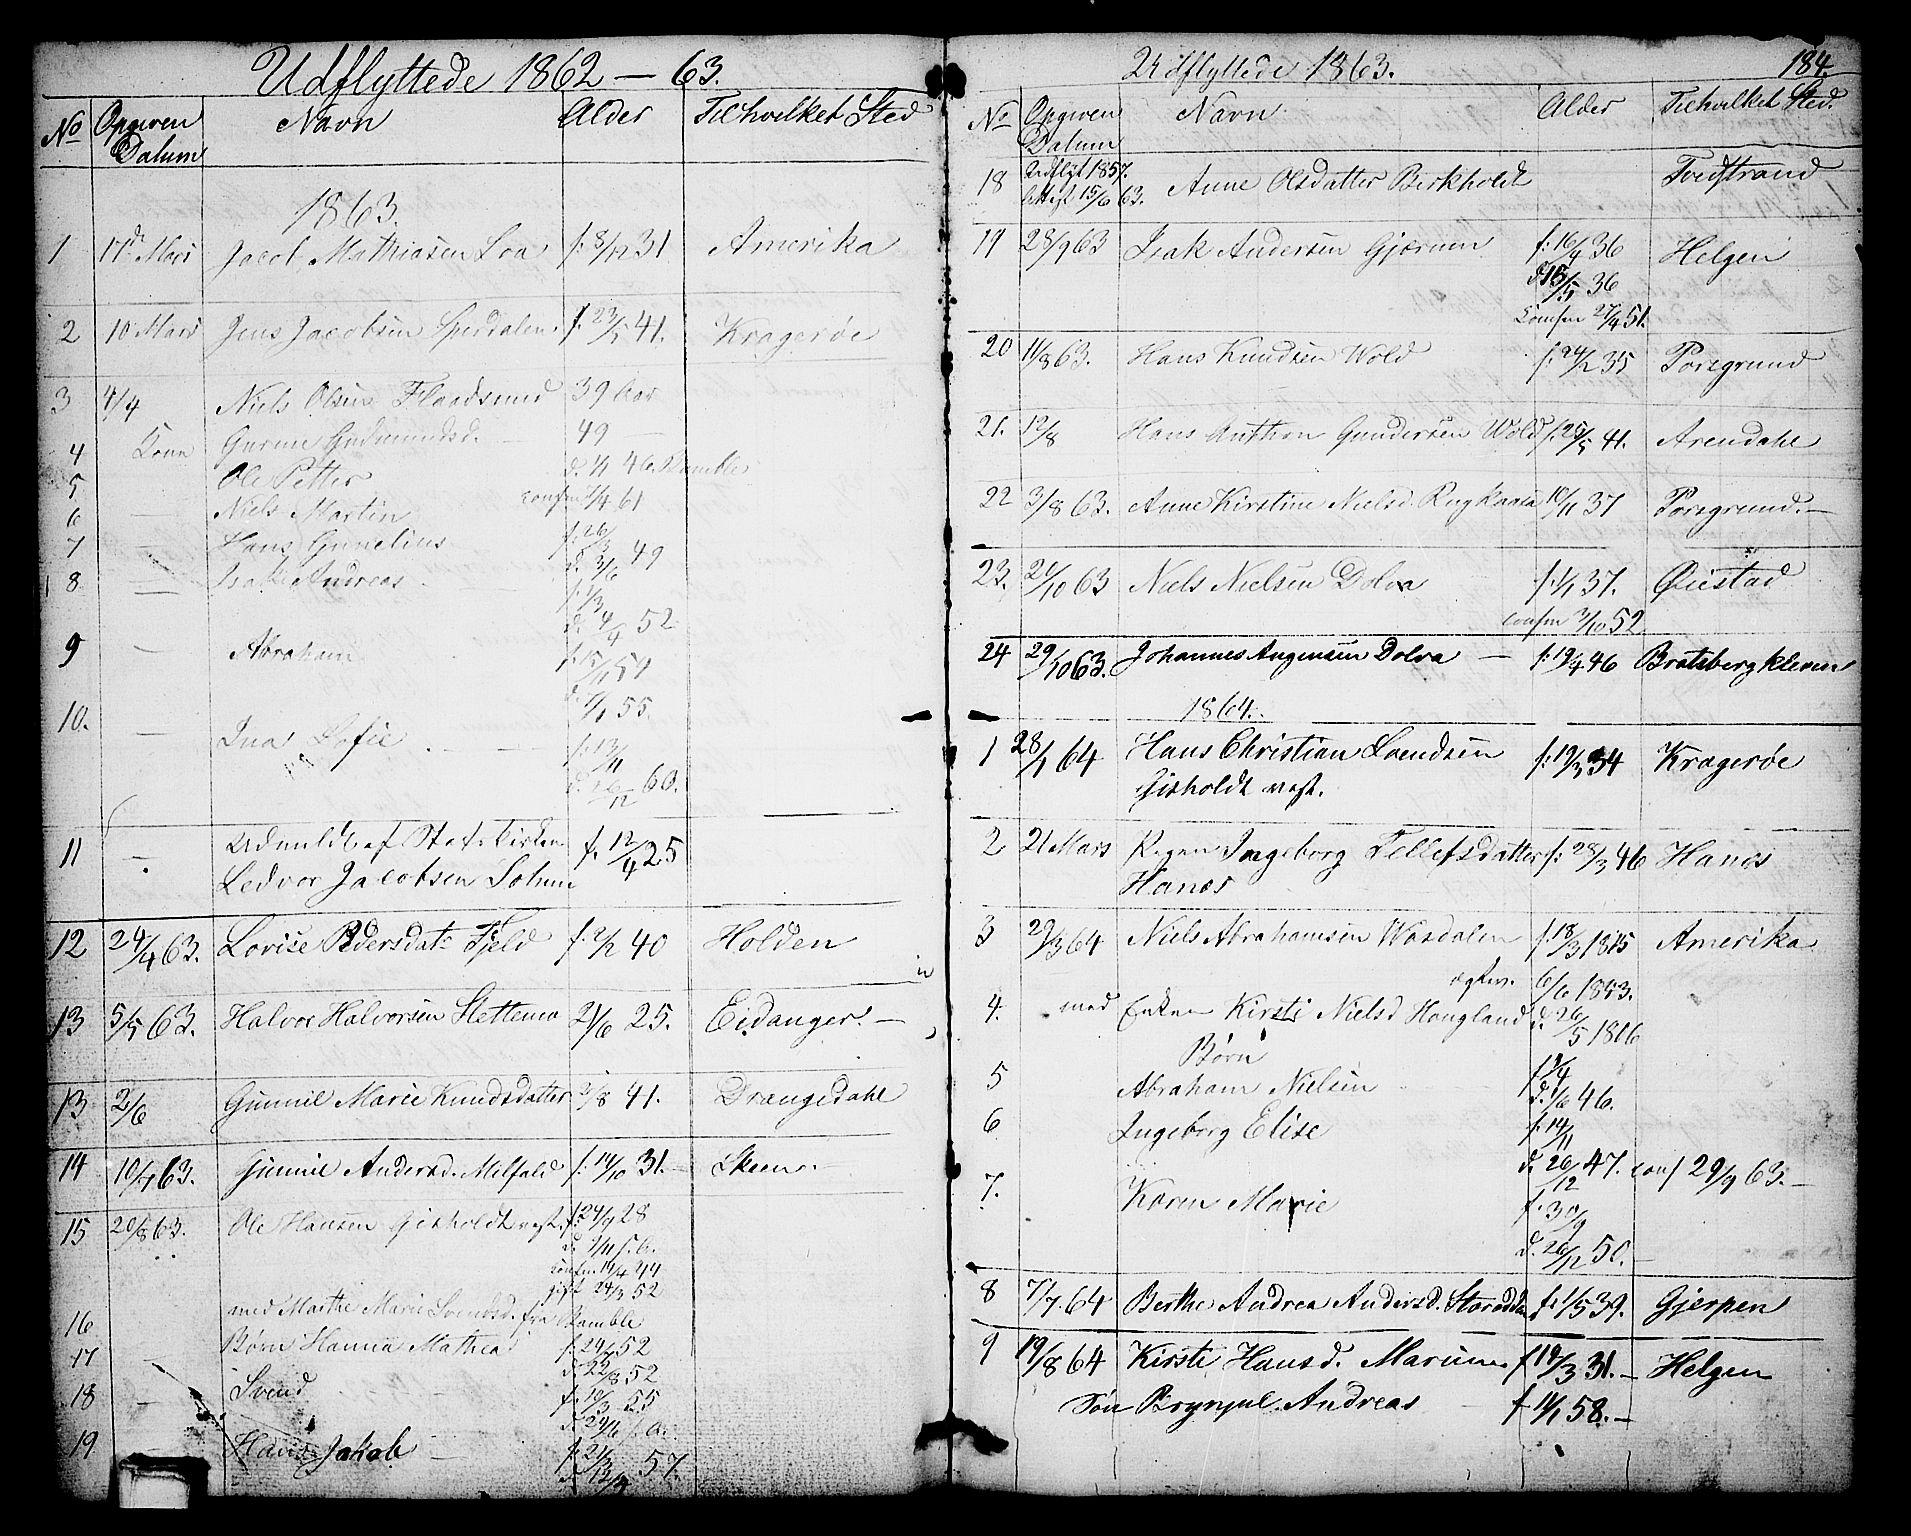 SAKO, Solum kirkebøker, G/Gb/L0002: Klokkerbok nr. II 2, 1859-1879, s. 184